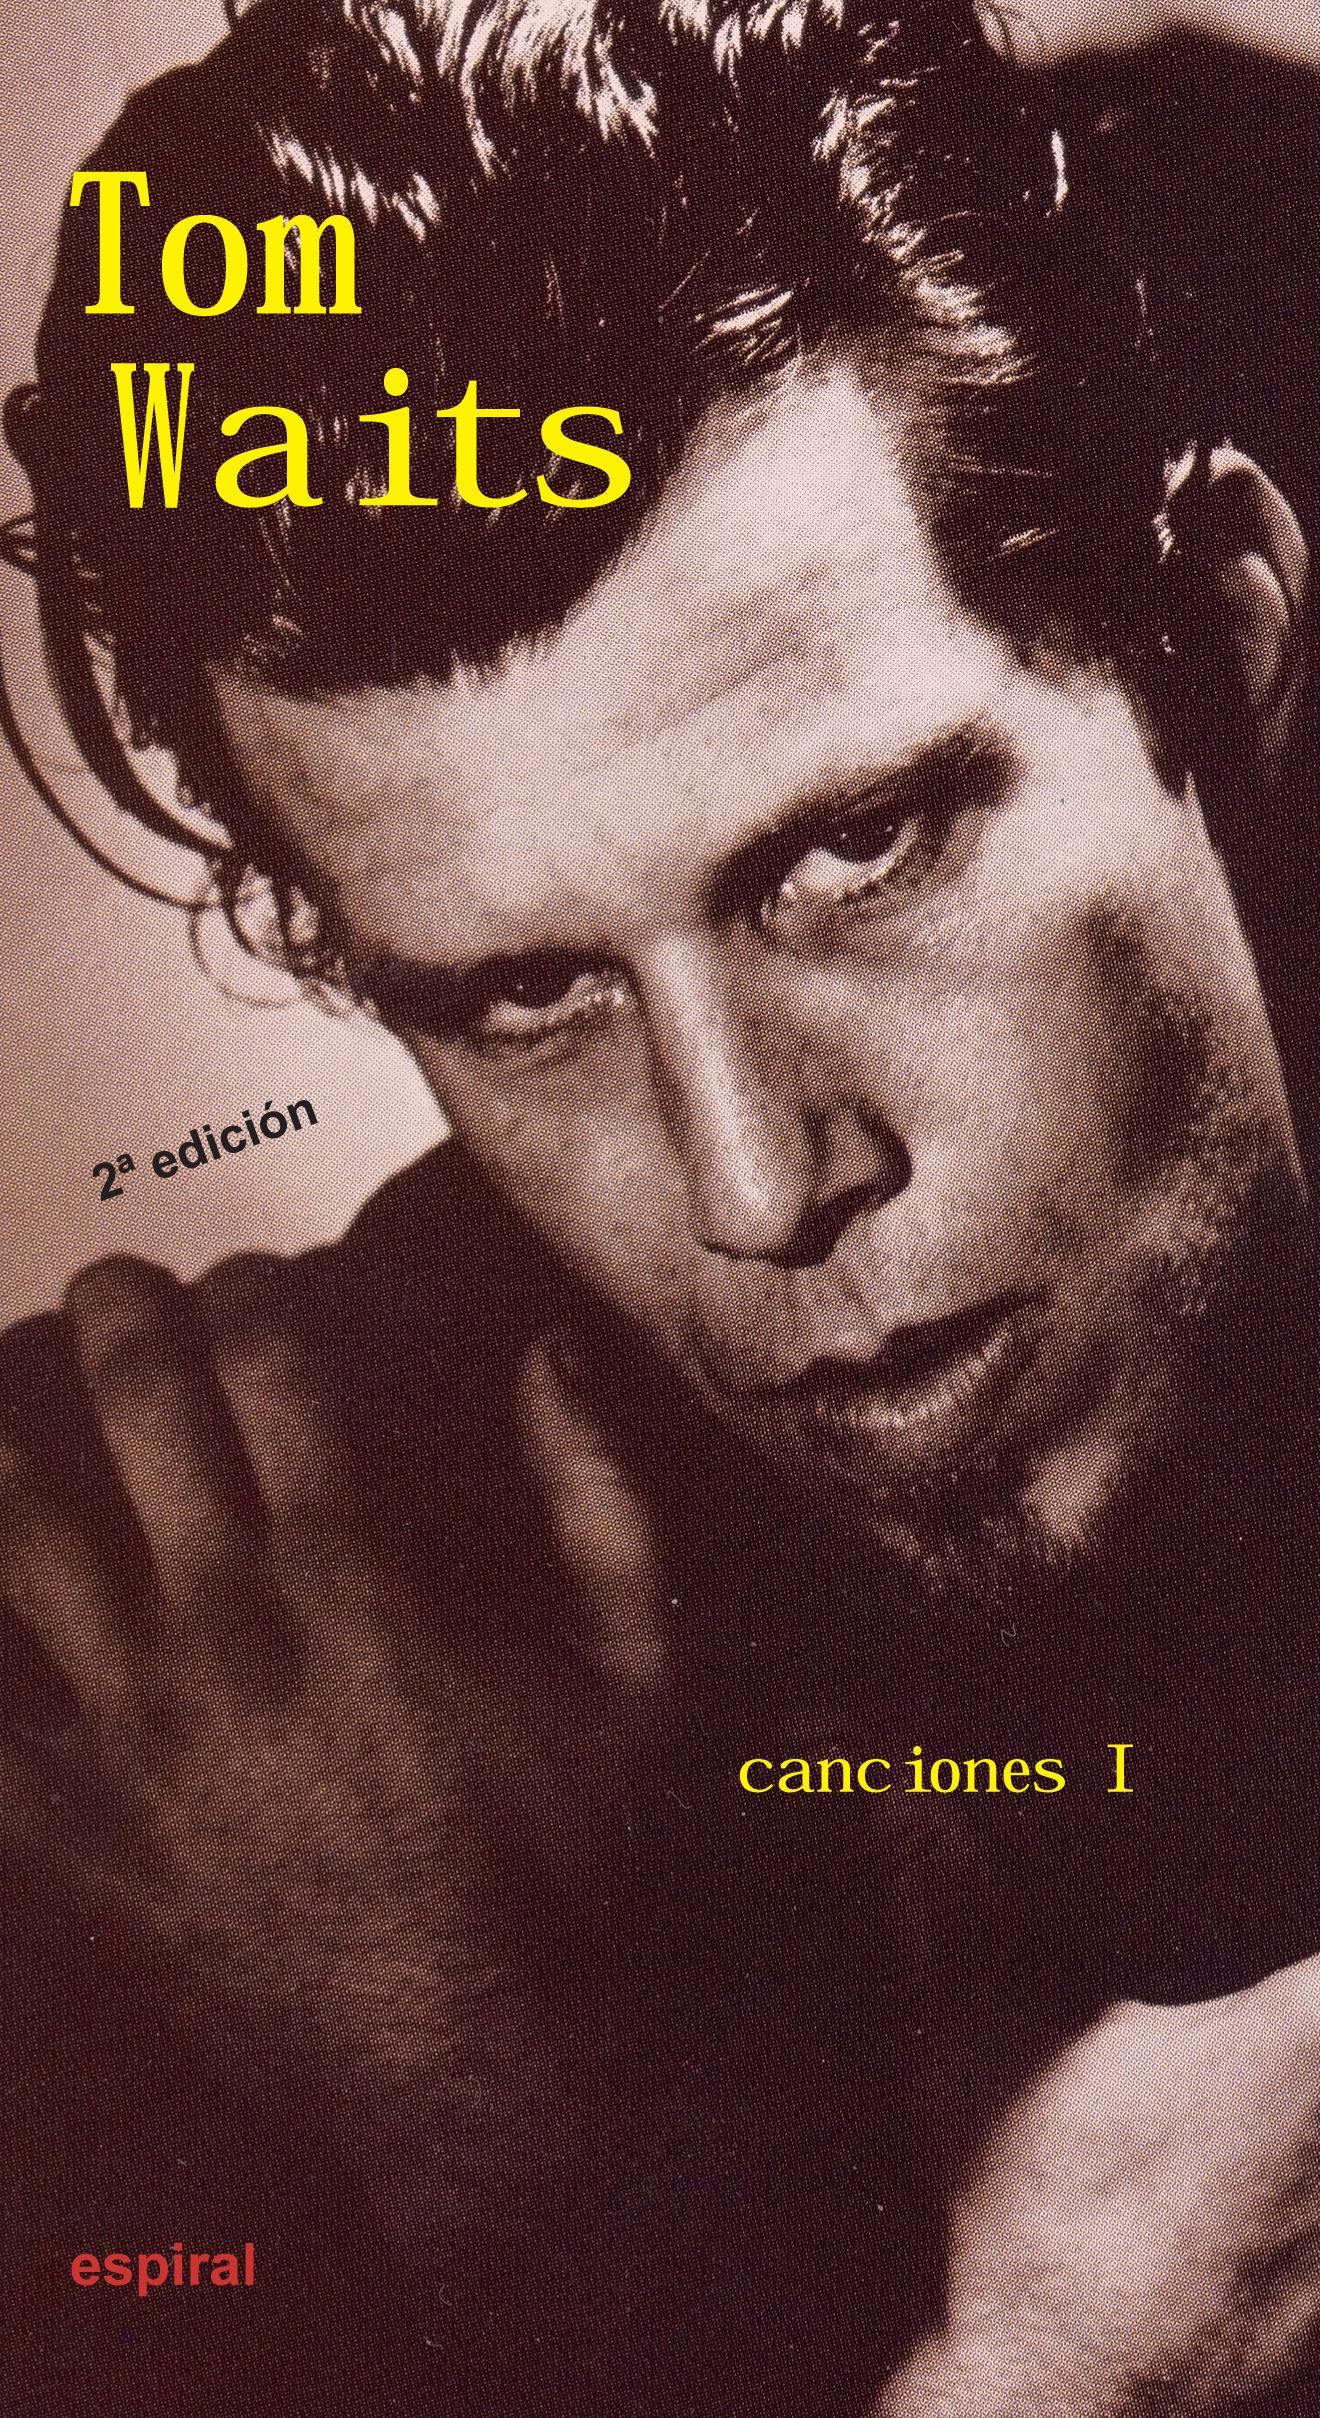 Canciones I (tom Waits) - Vv.aa.